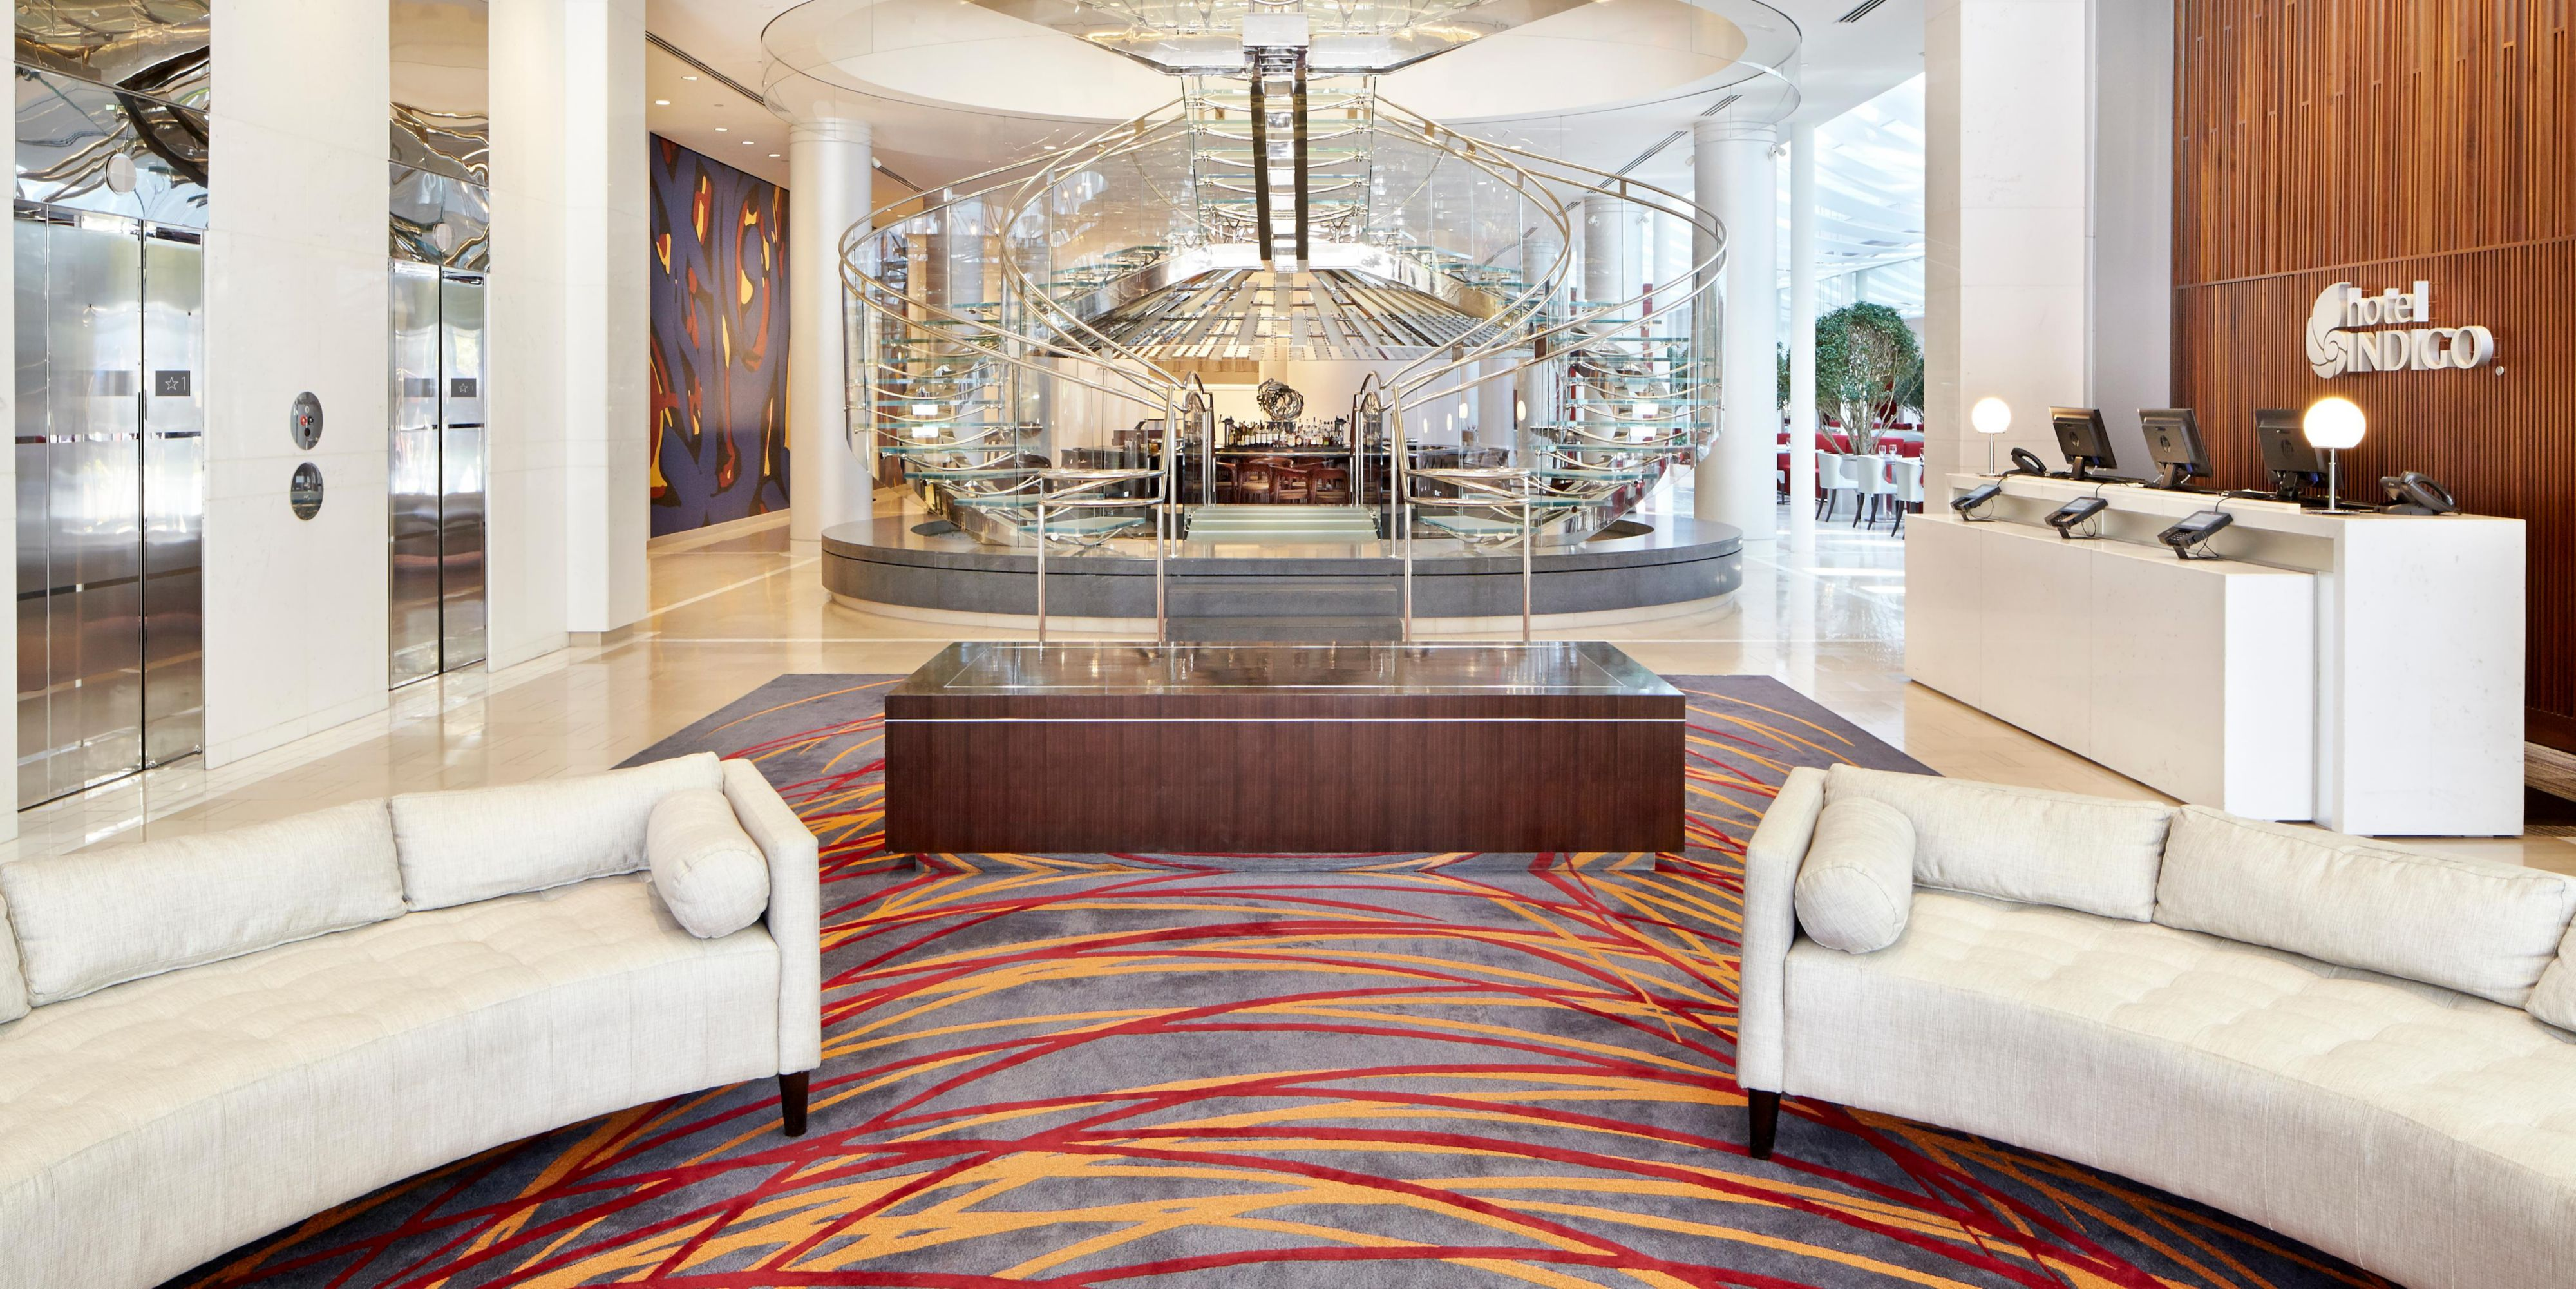 Dating coach atlanta ga hotels